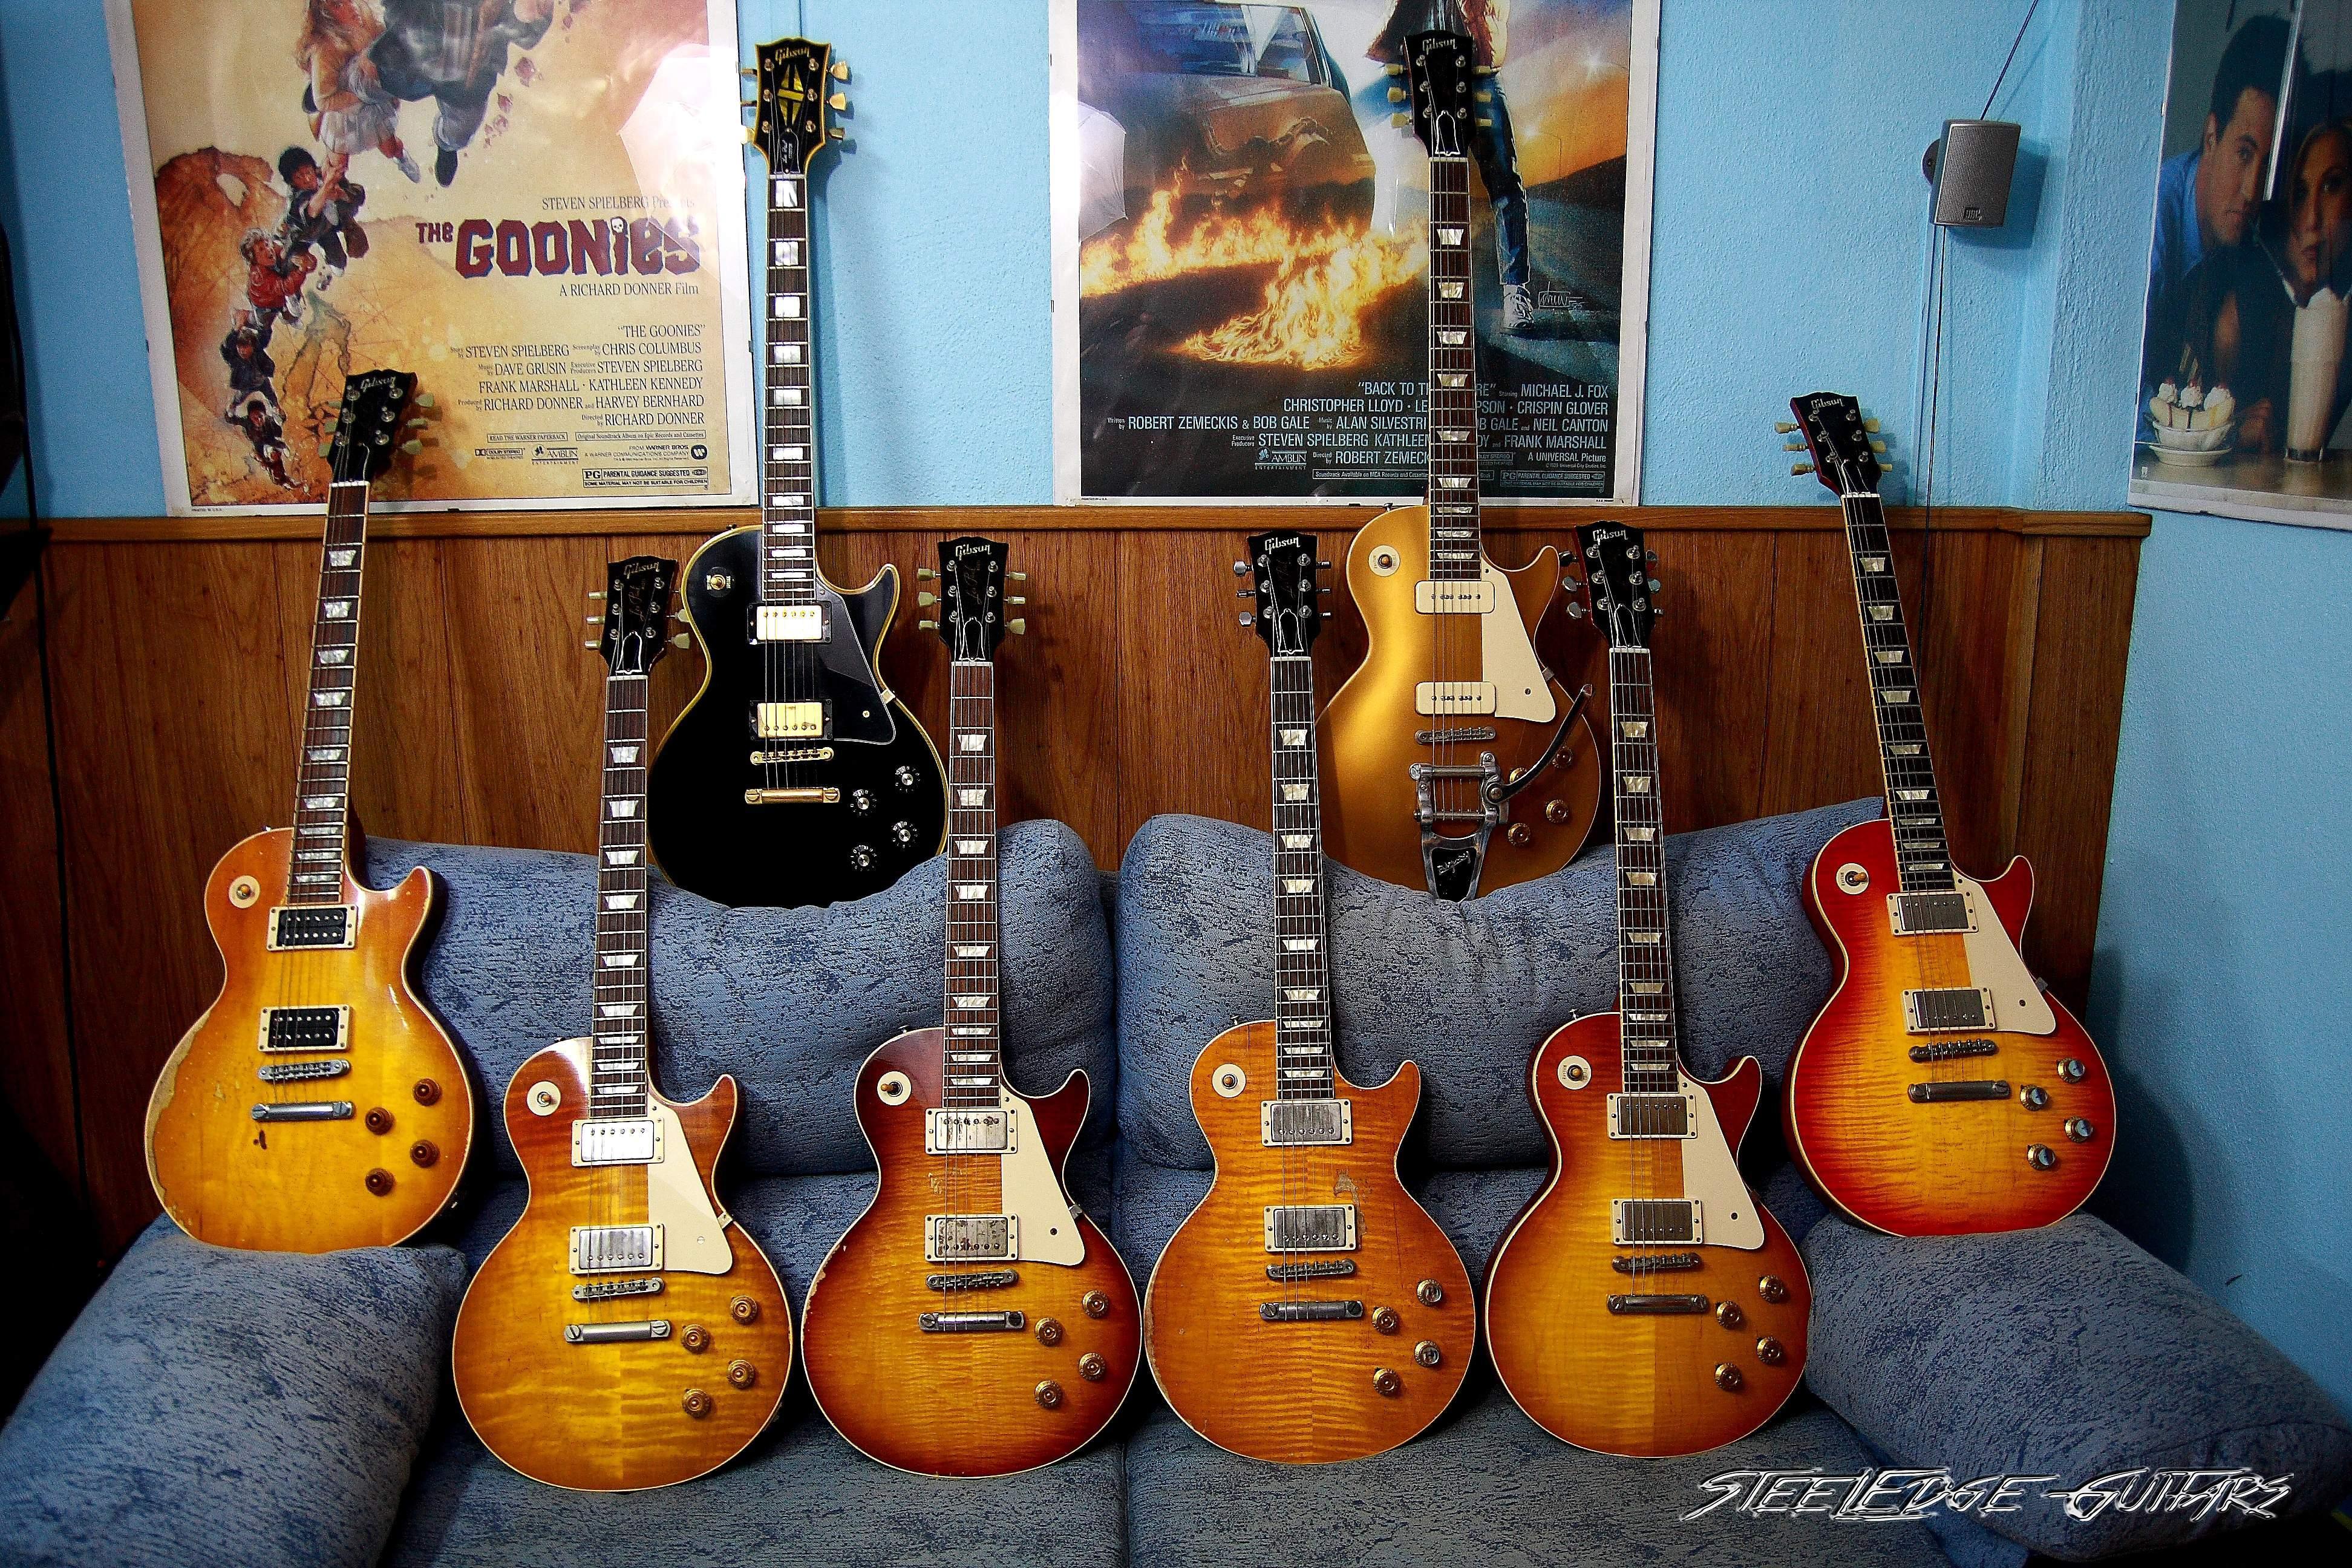 steeledge guitars steeledge guitar collection. Black Bedroom Furniture Sets. Home Design Ideas